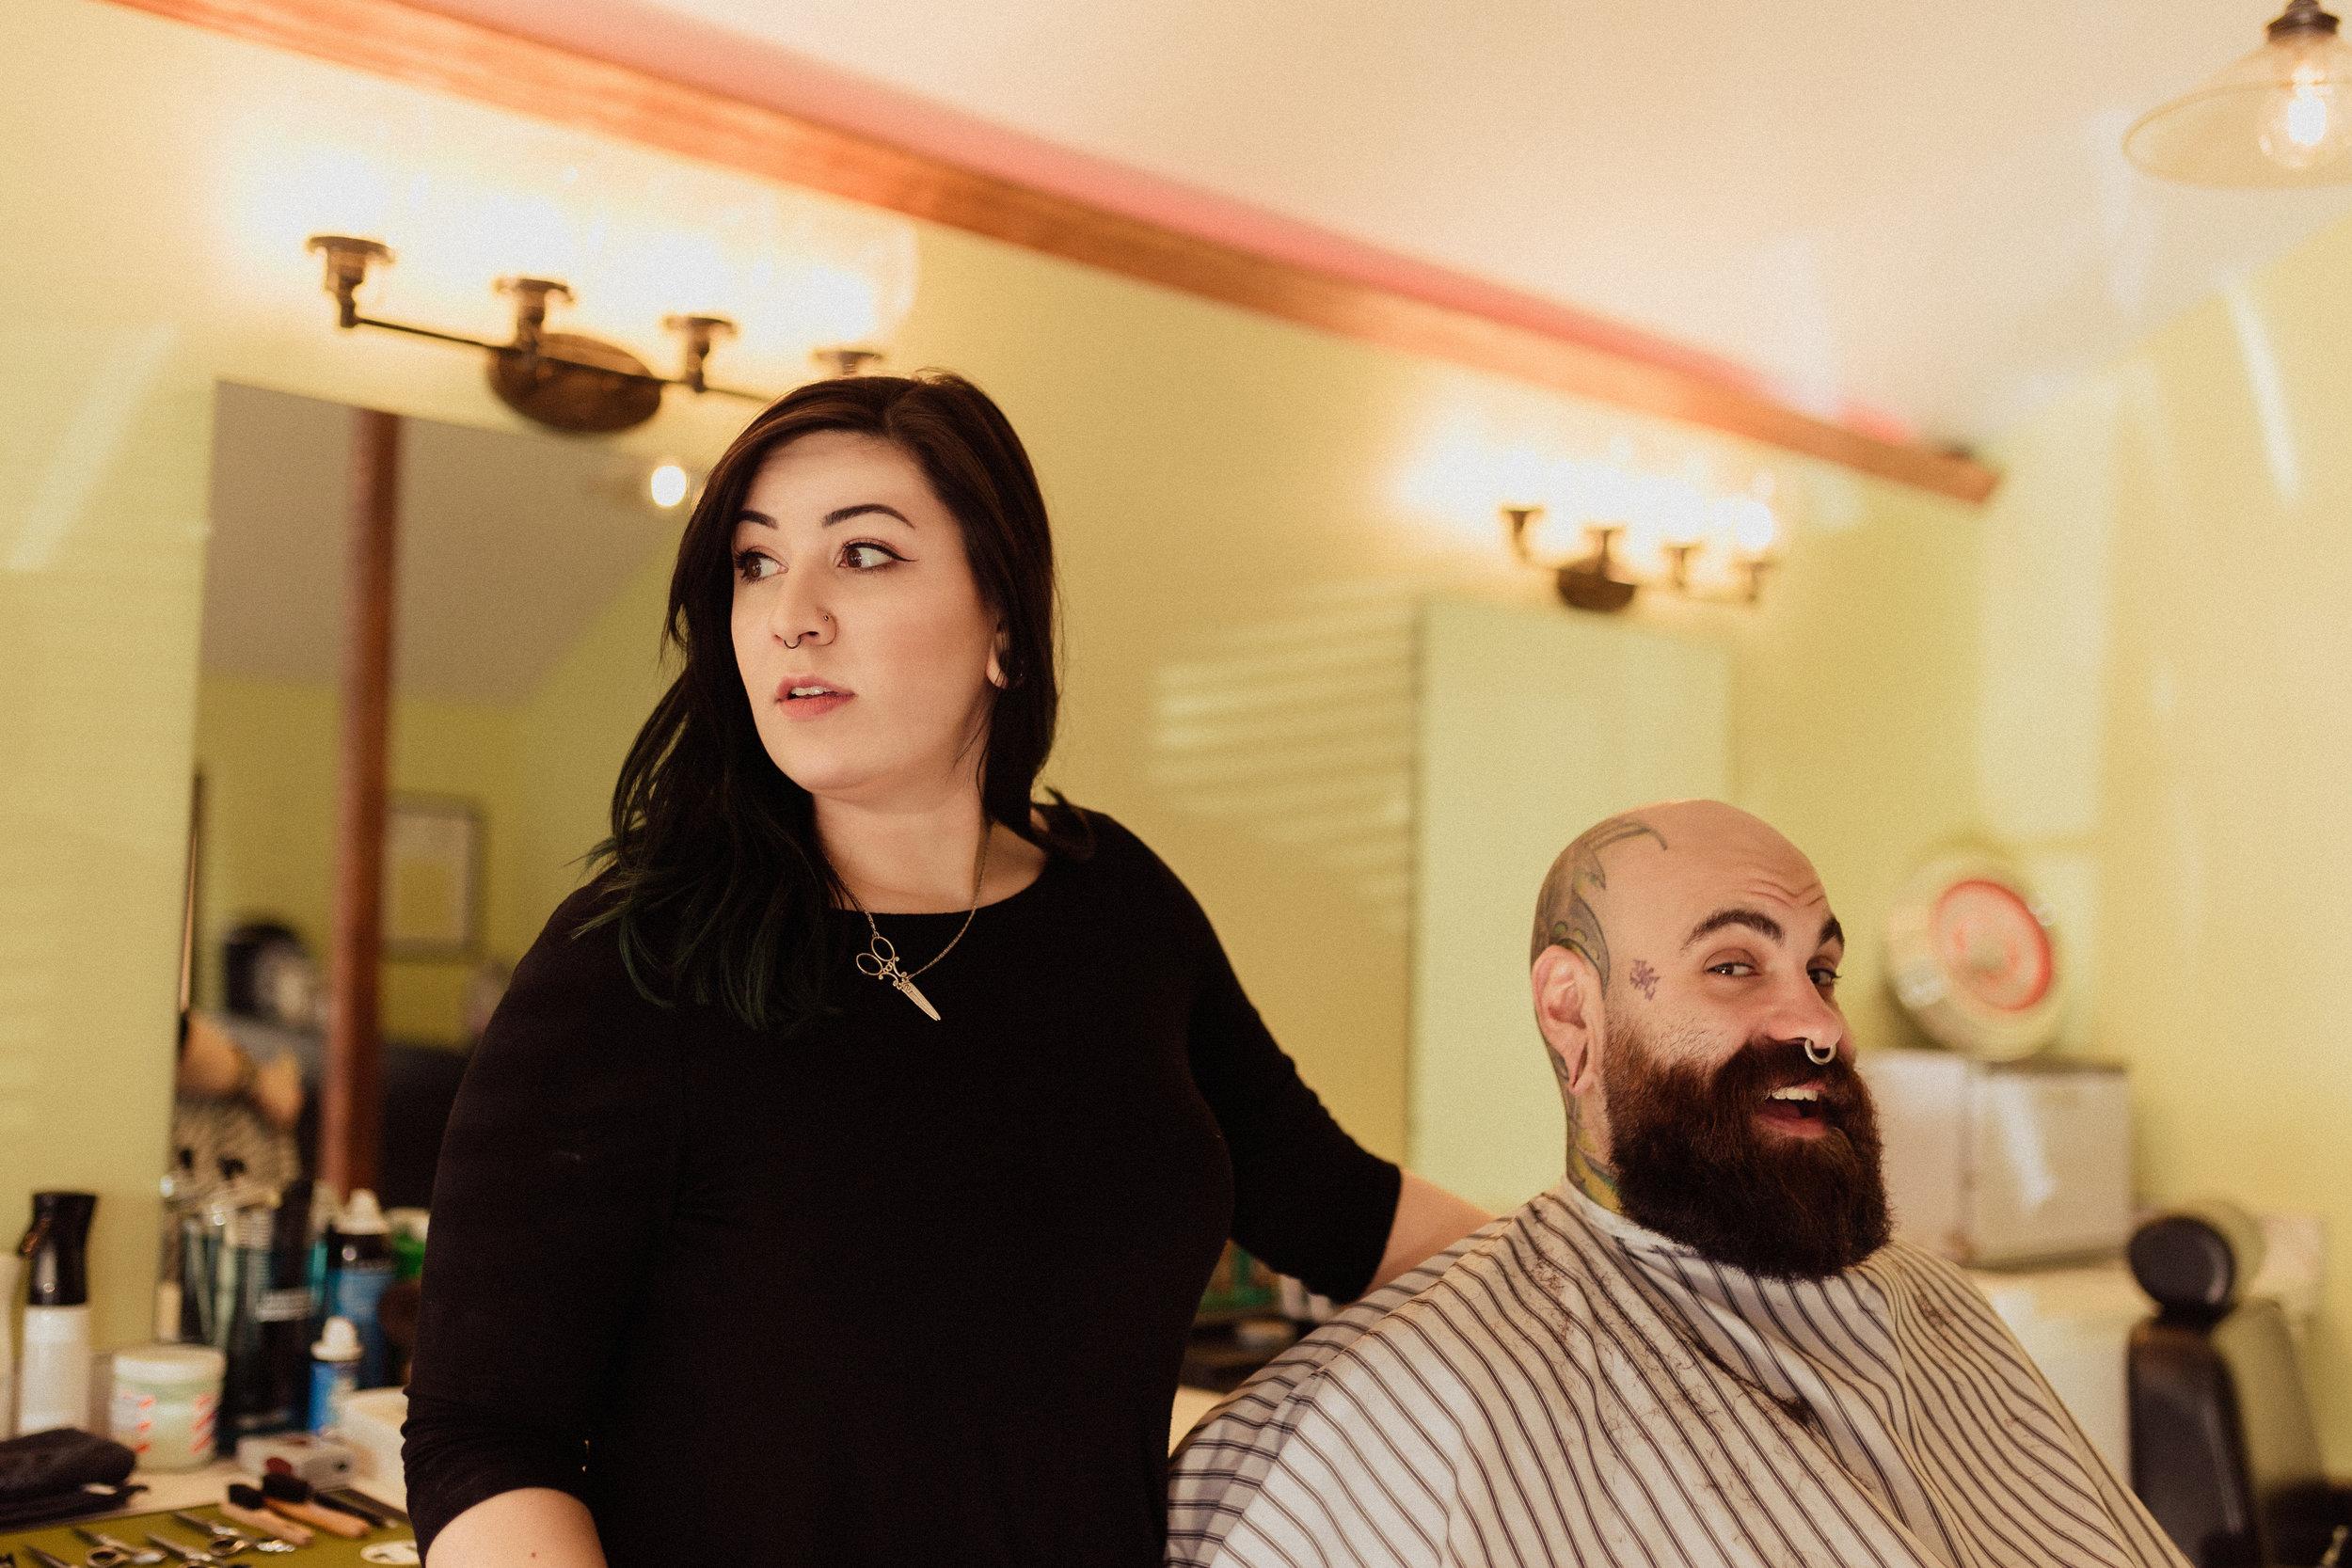 021018 - union barber 11.jpg